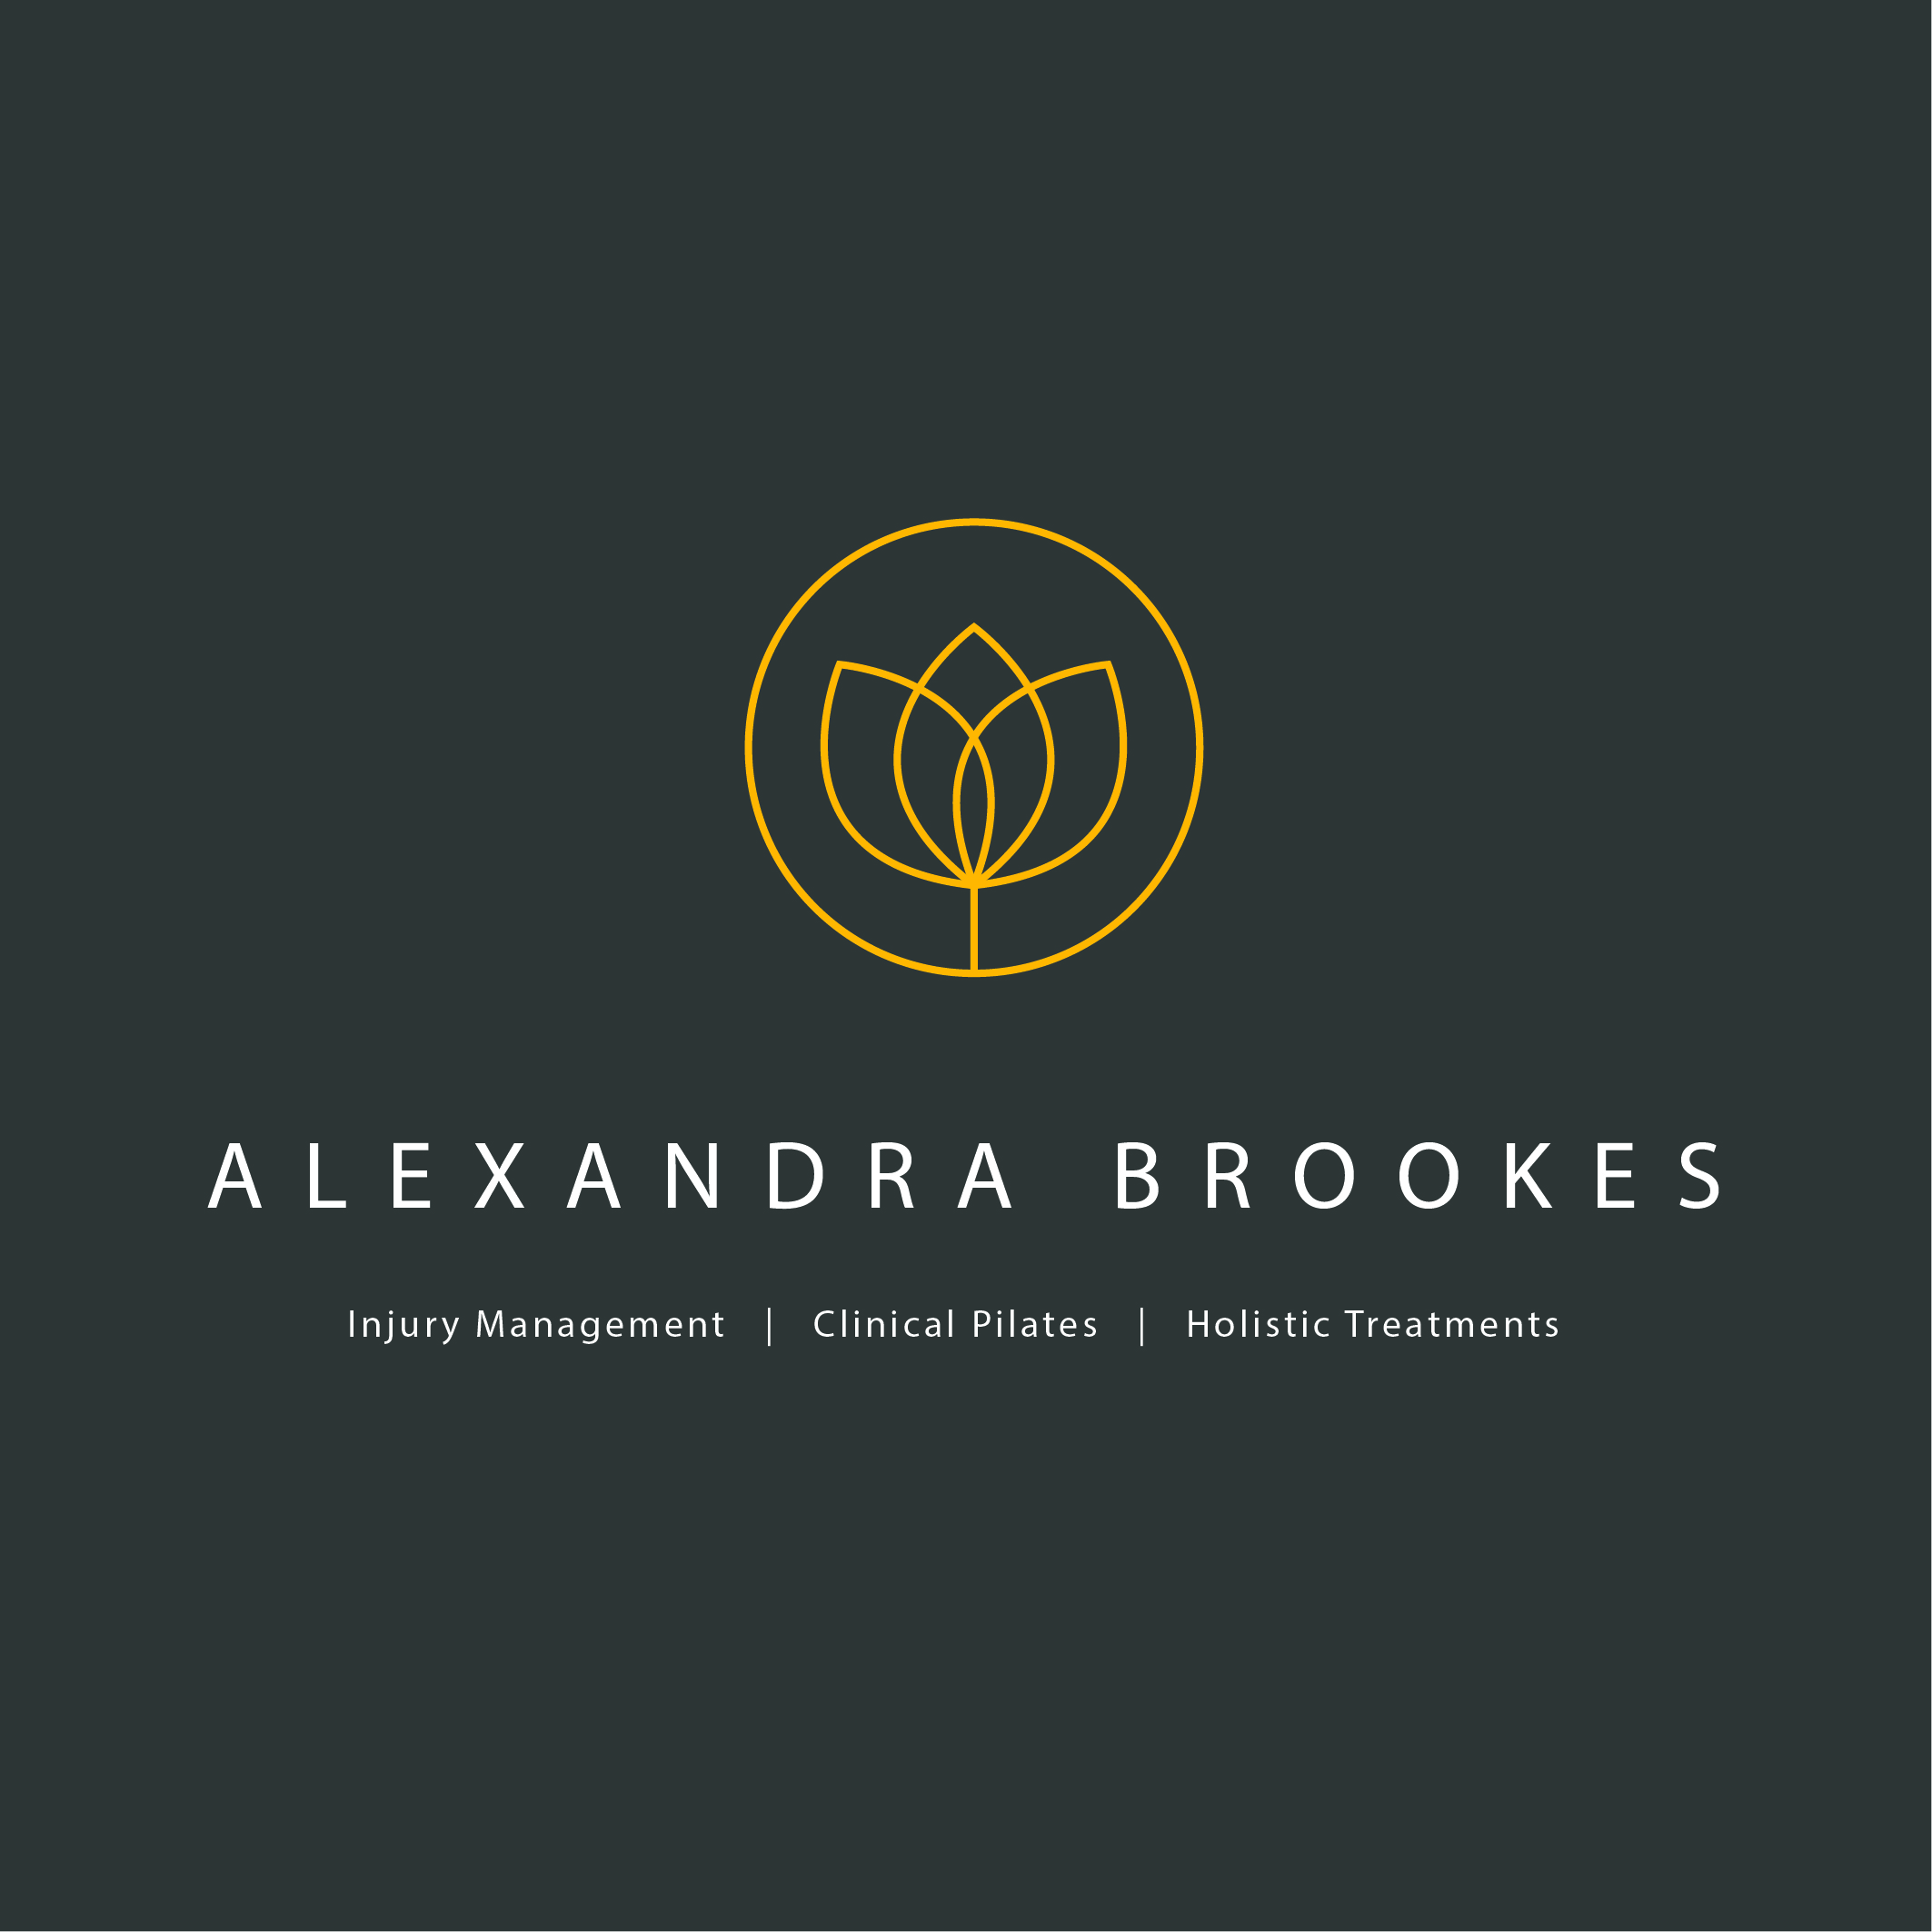 Alexandra Brookes